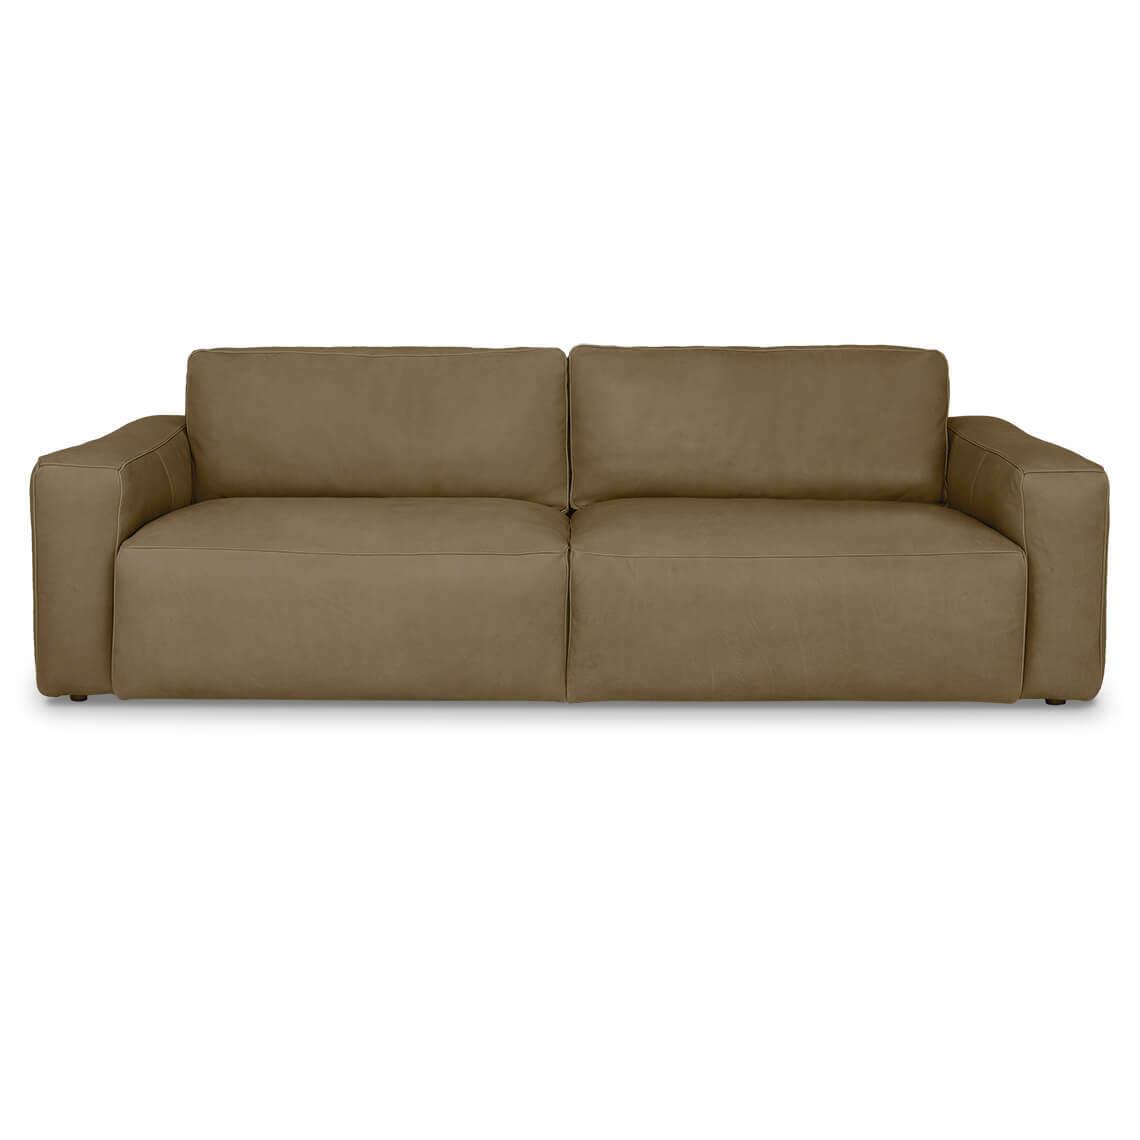 WDT_2_wk36_Leather Sofas.jpg